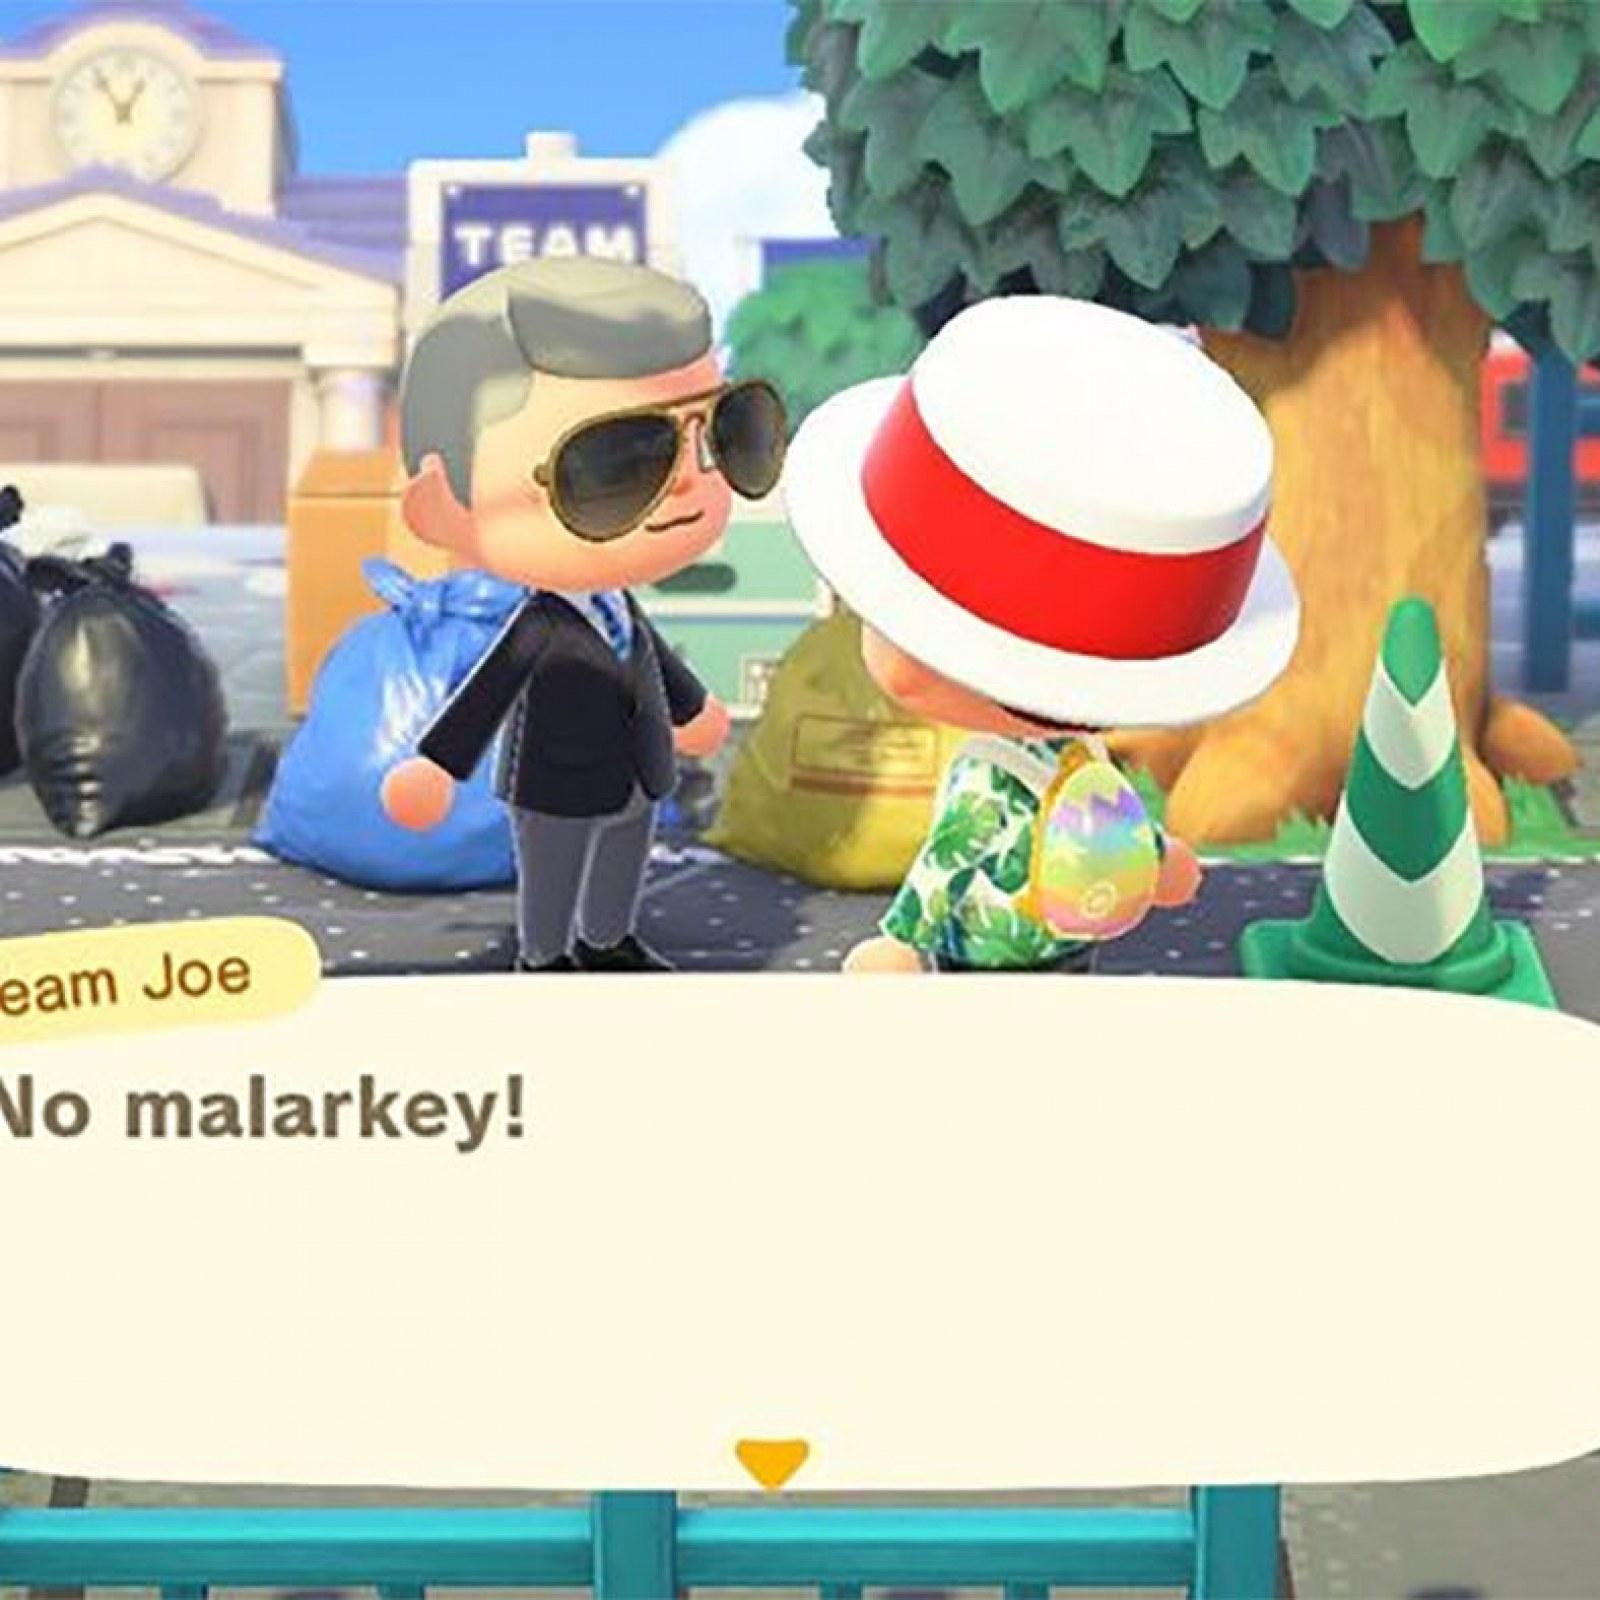 Joe Biden Has An Animal Crossing New Horizons Island And We Visited